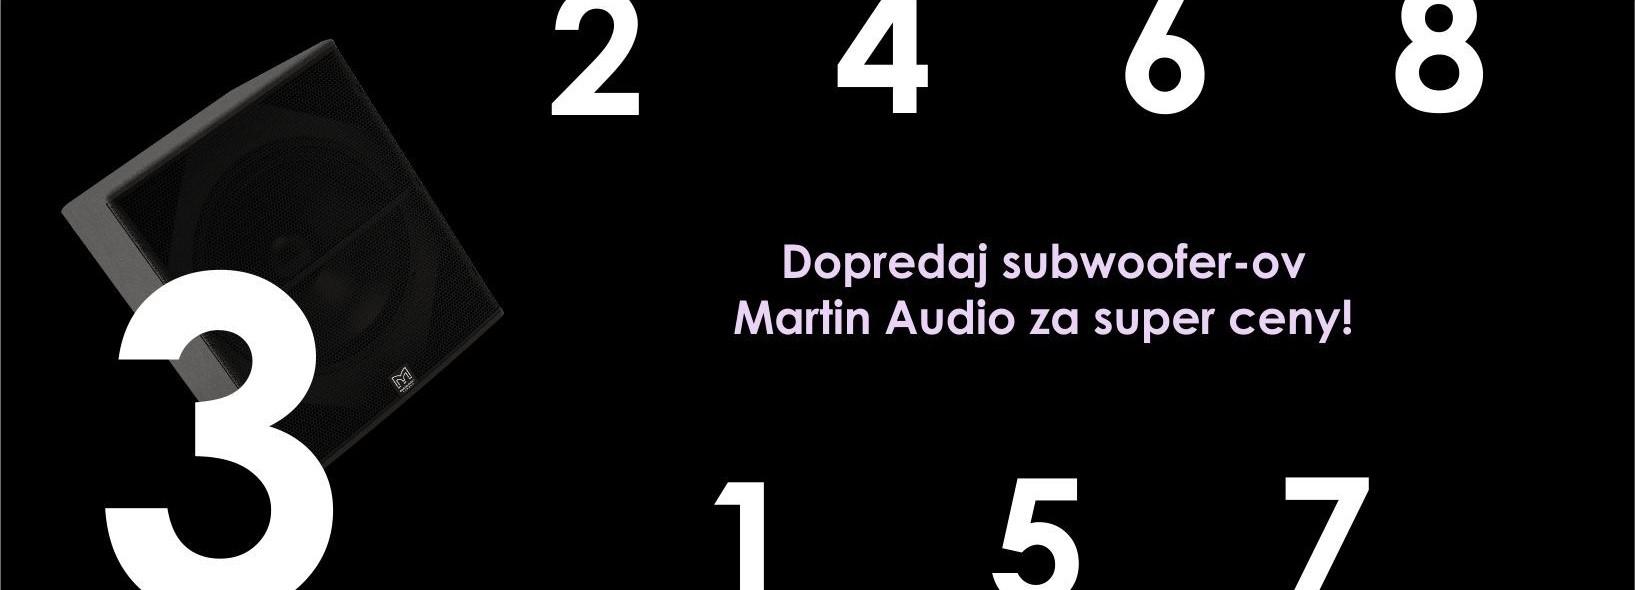 Dopredaj subwoofer-ov CSX Martin Audio